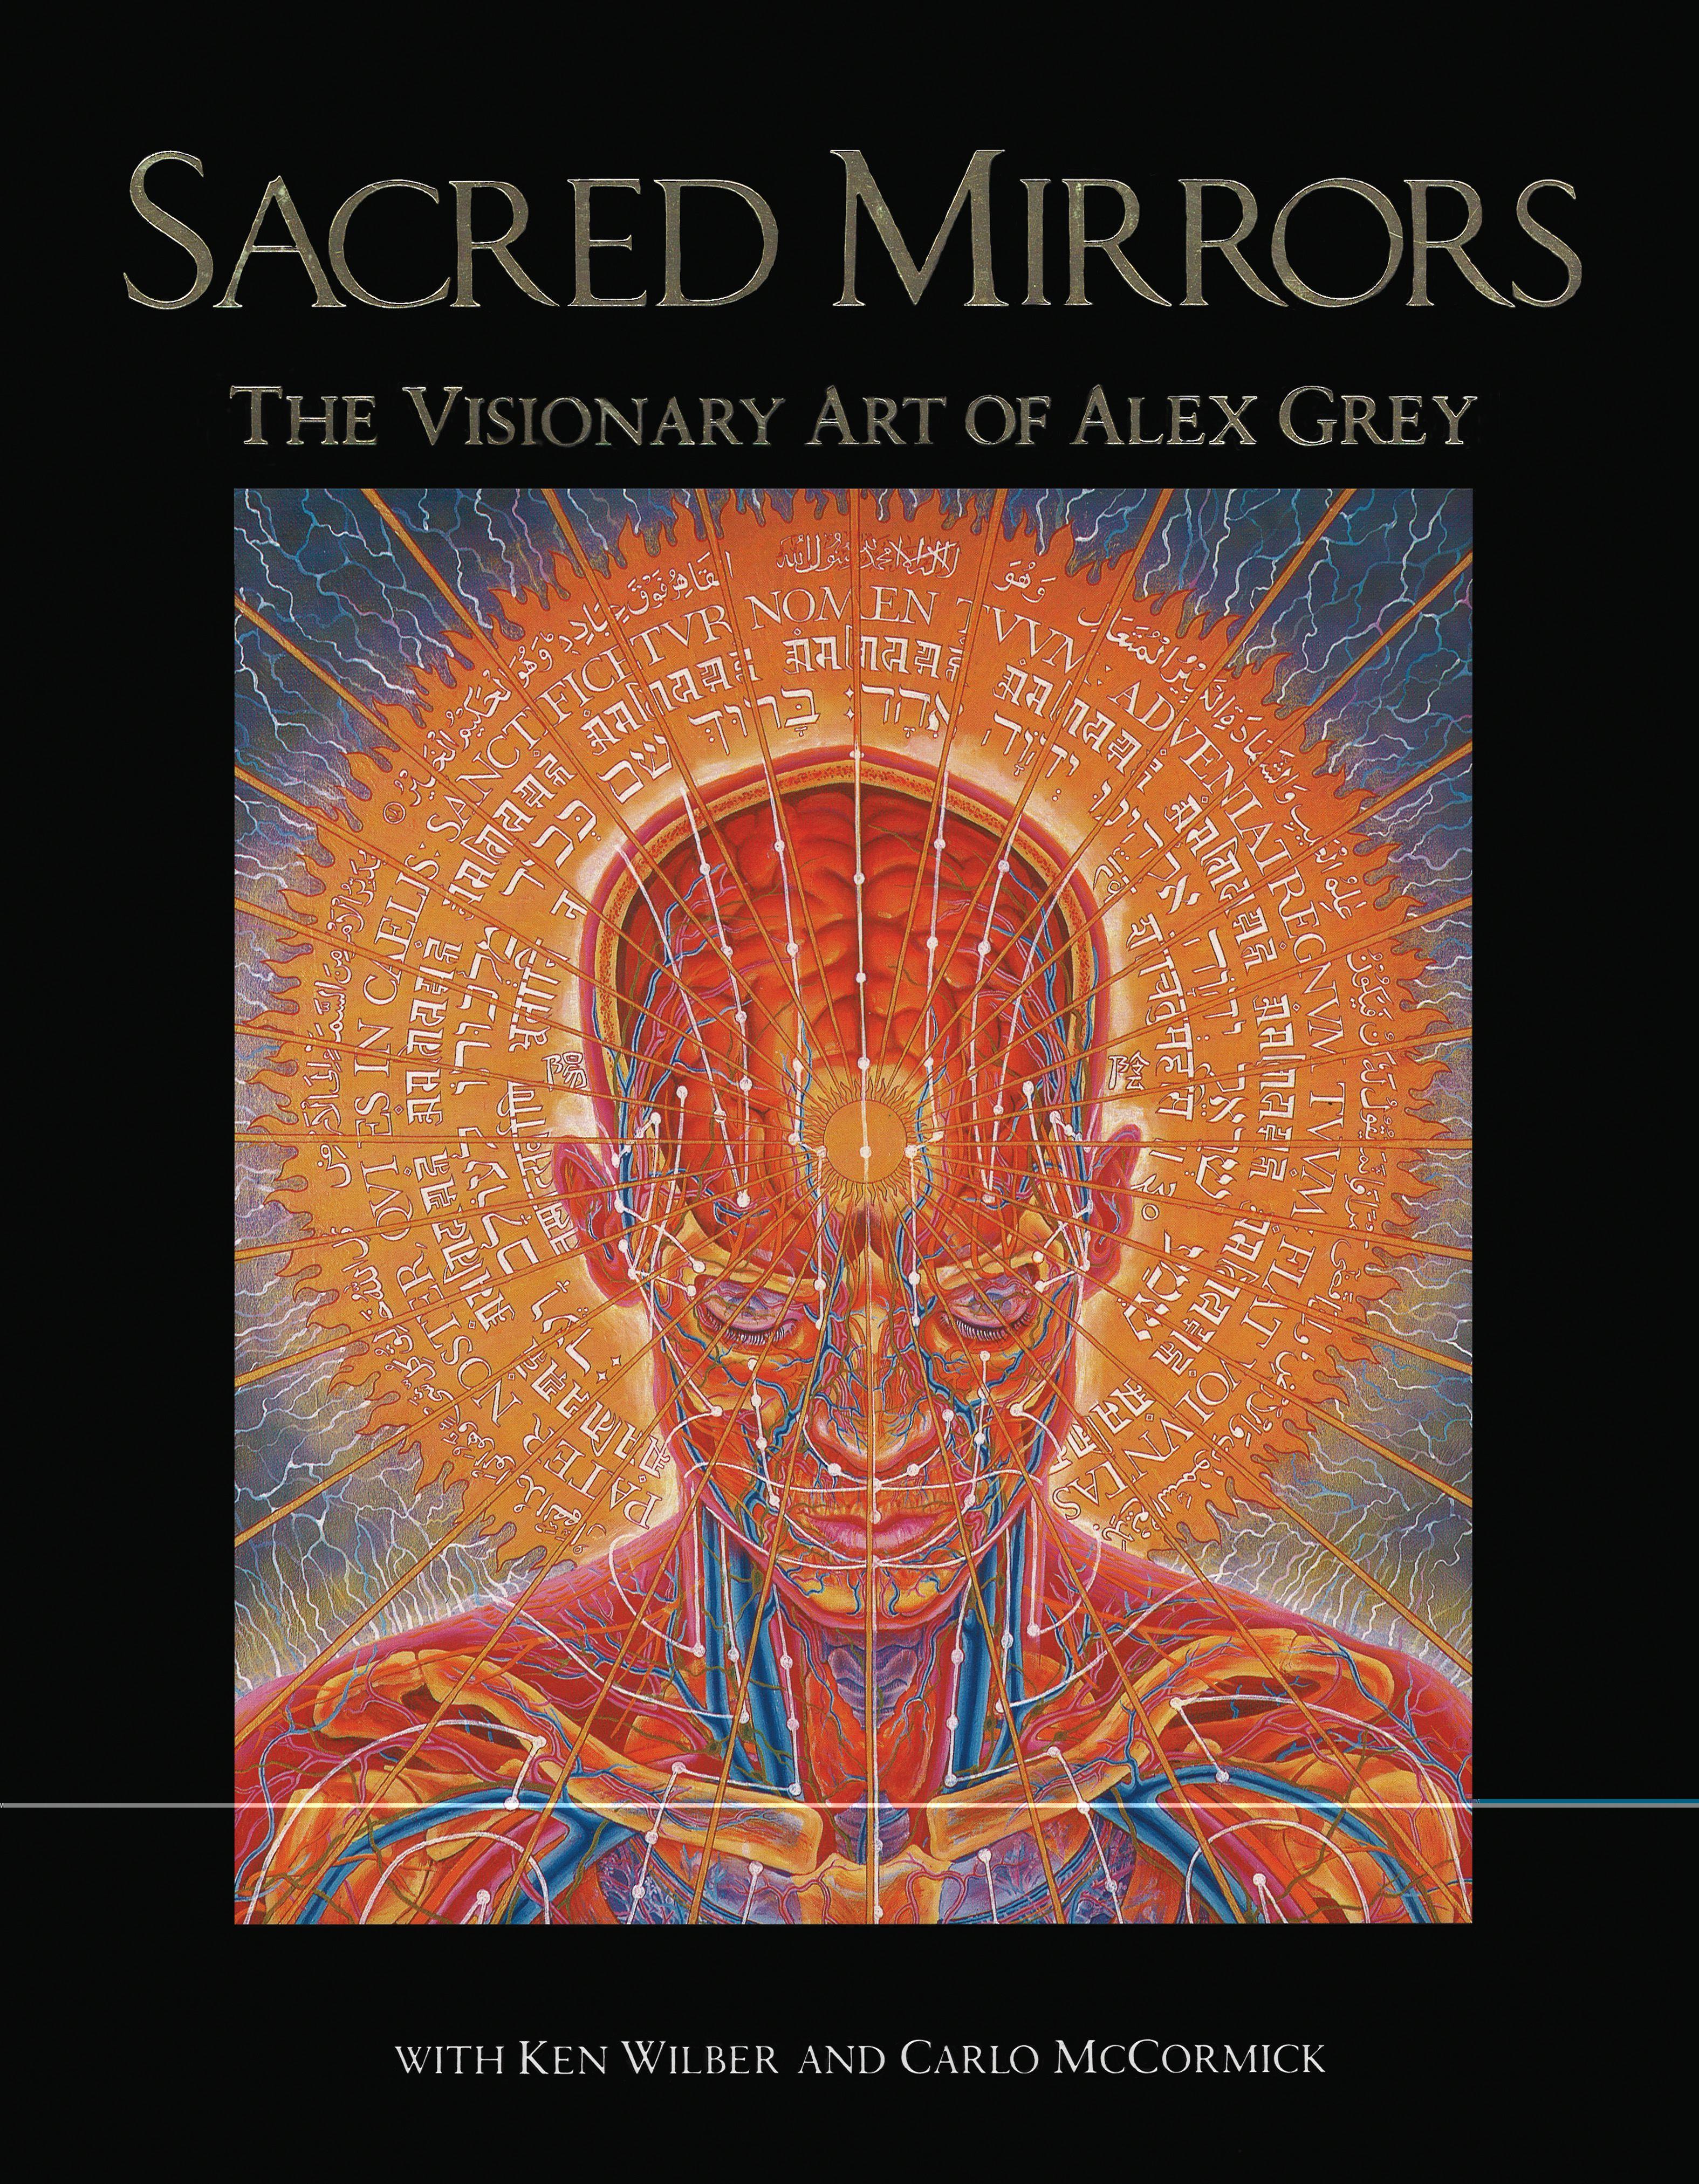 Sacred mirrors 9780892812578 hr